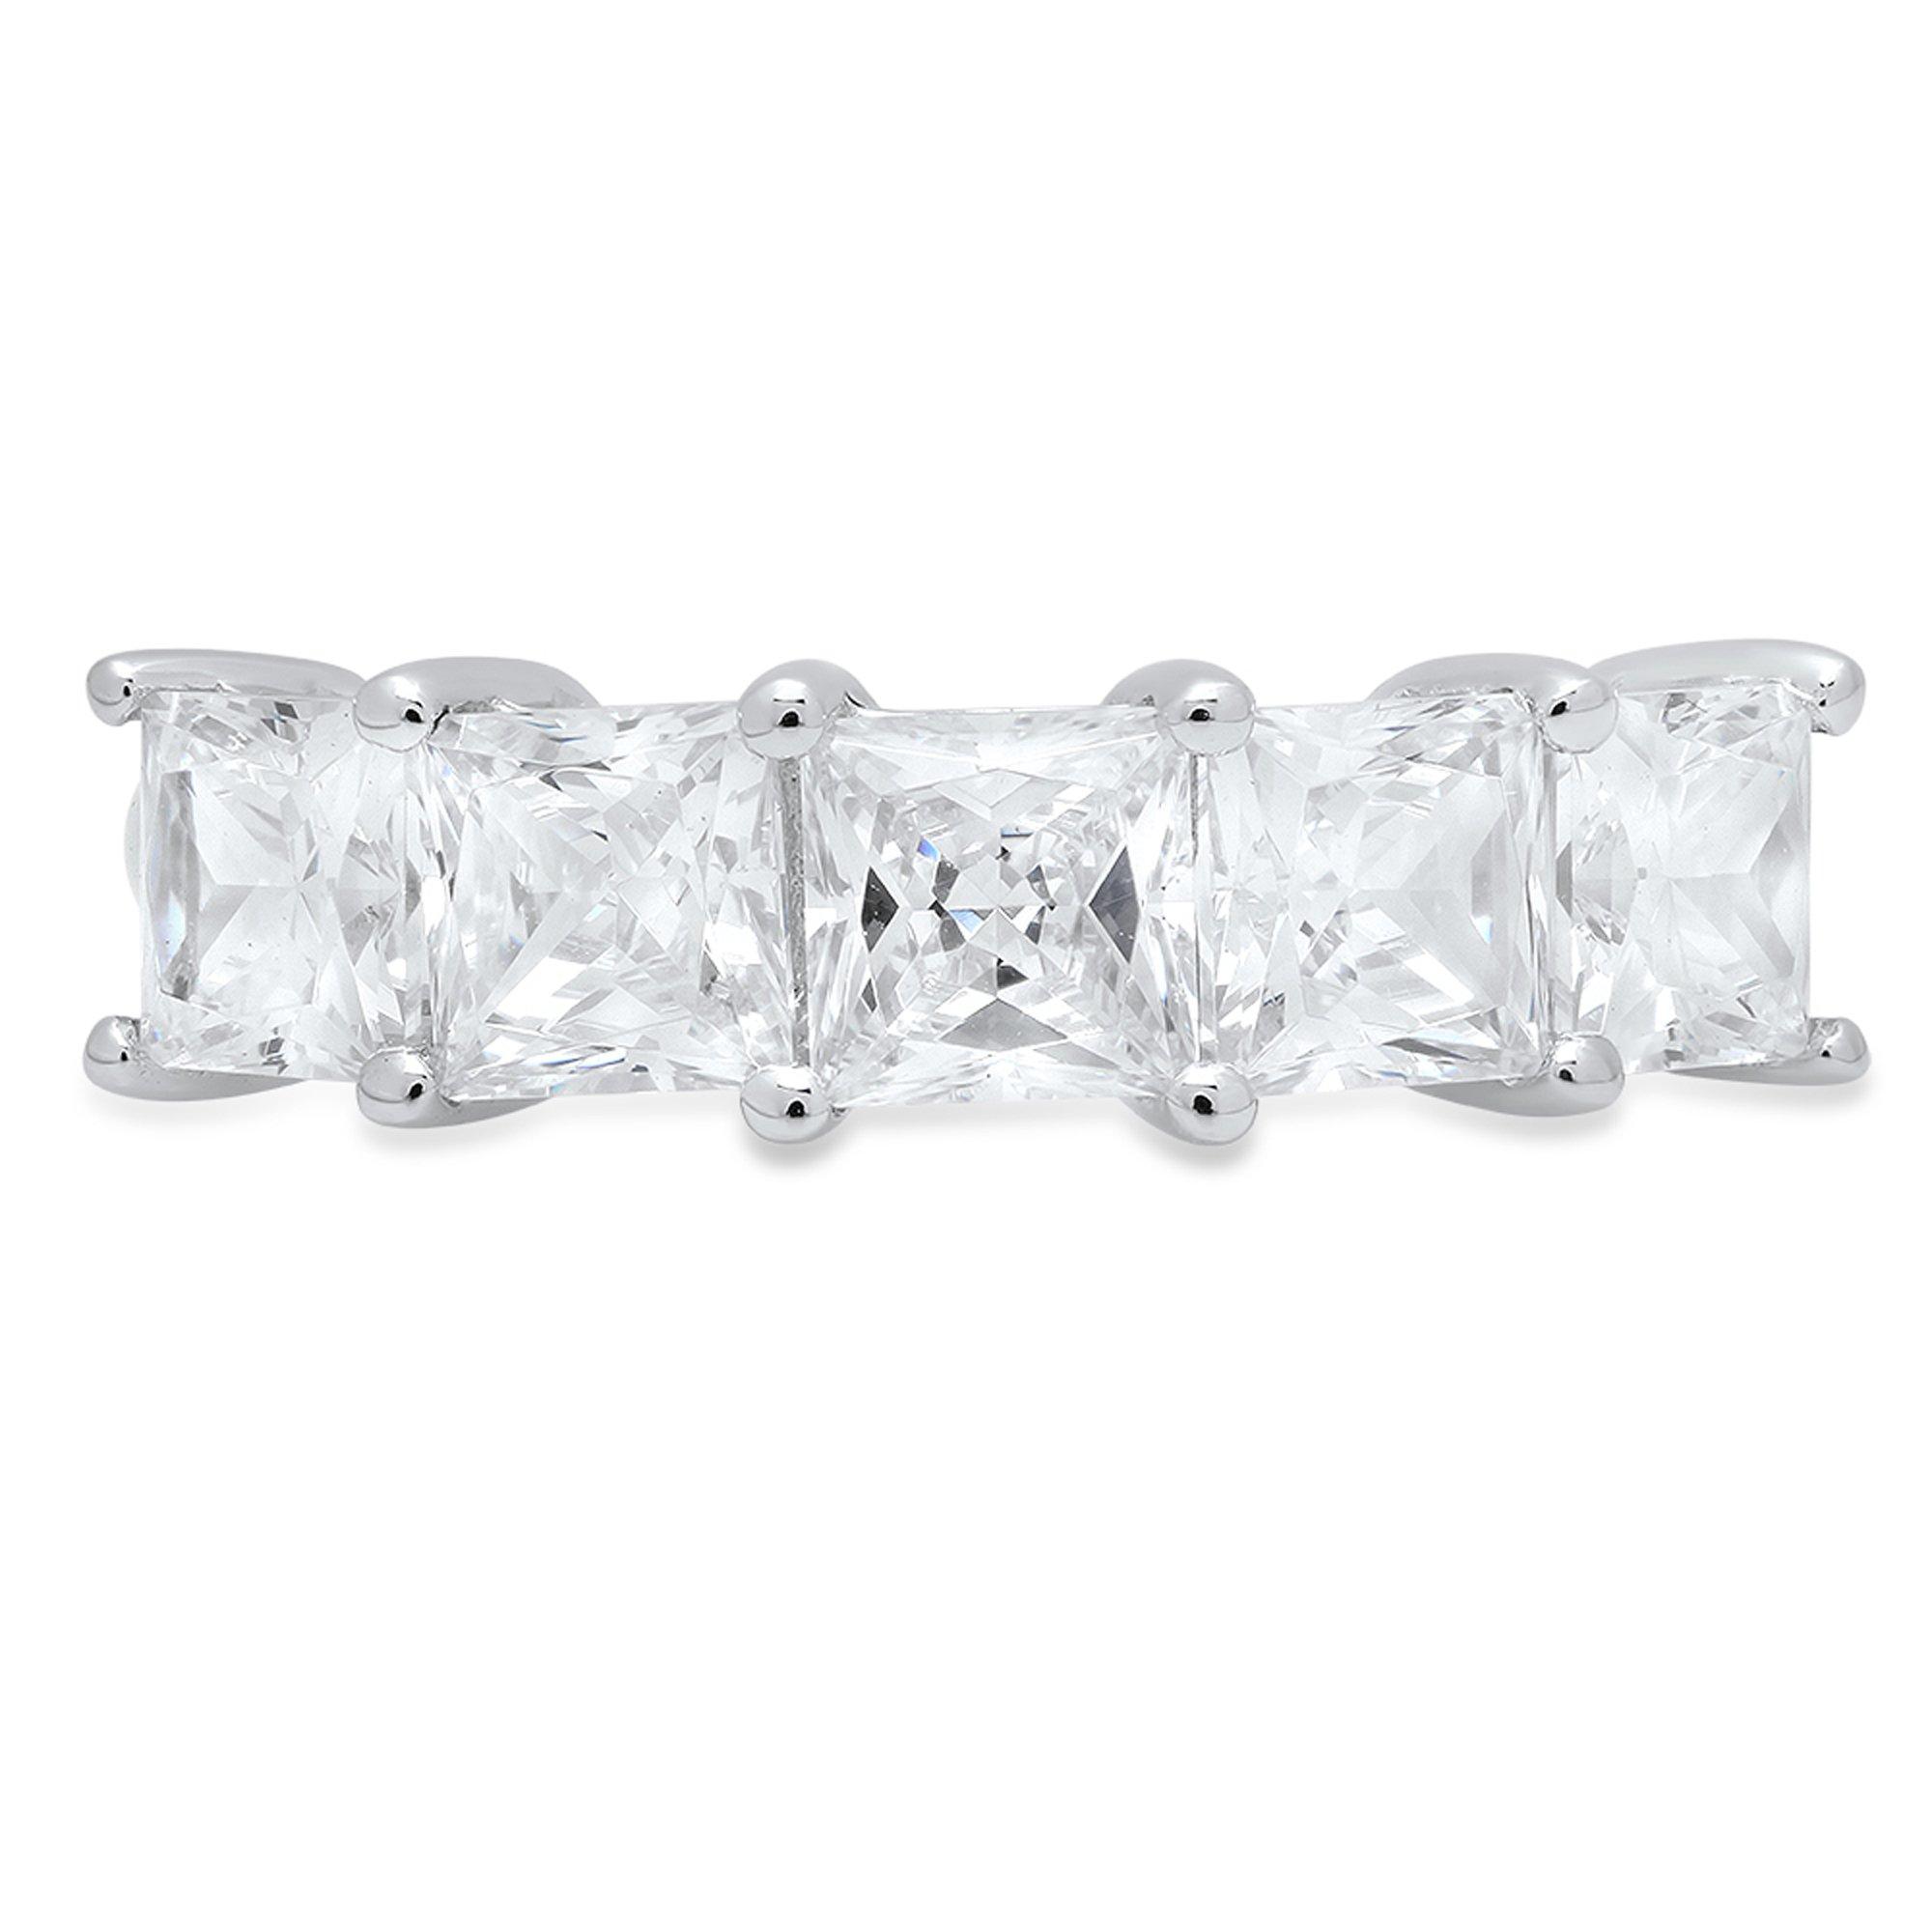 Clara Pucci 3.75 ct Brilliant Princess Cut Simulated Diamond CZ Designer Brial Promise Bridal Wedding Band in 14K Solid White Gold